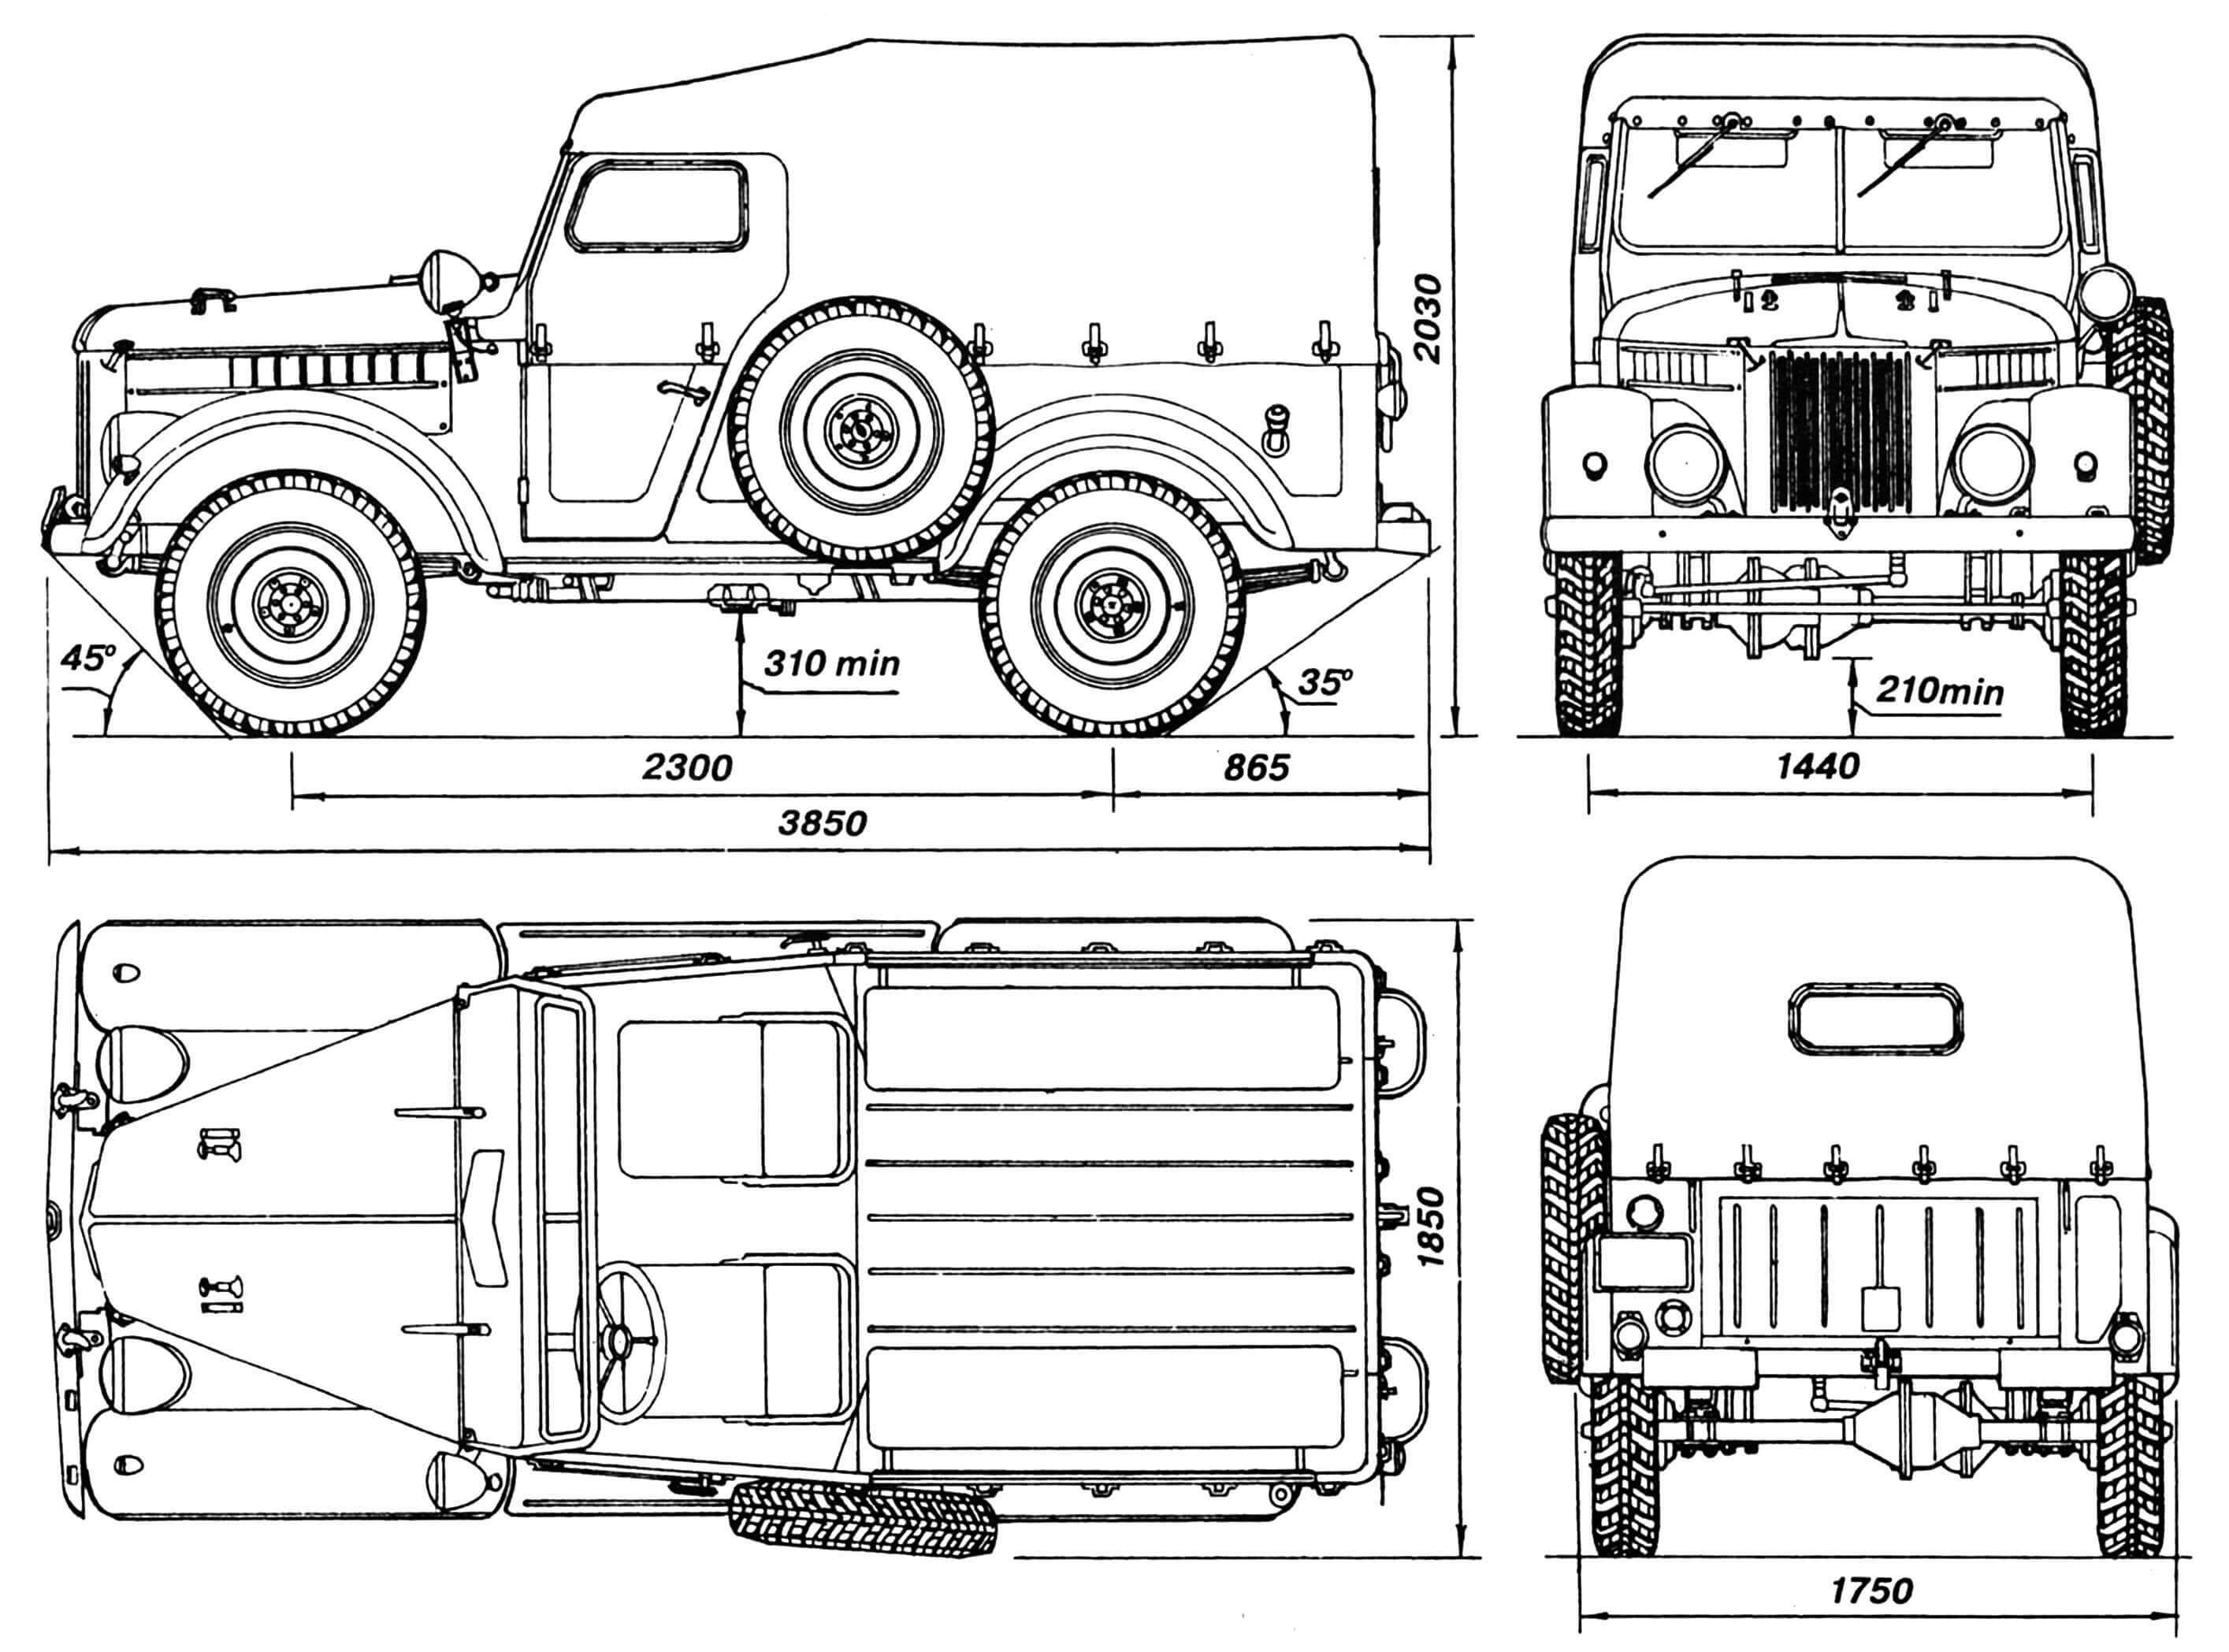 Автомобиль ГАЗ-69 (на виде сверху тент не показан).